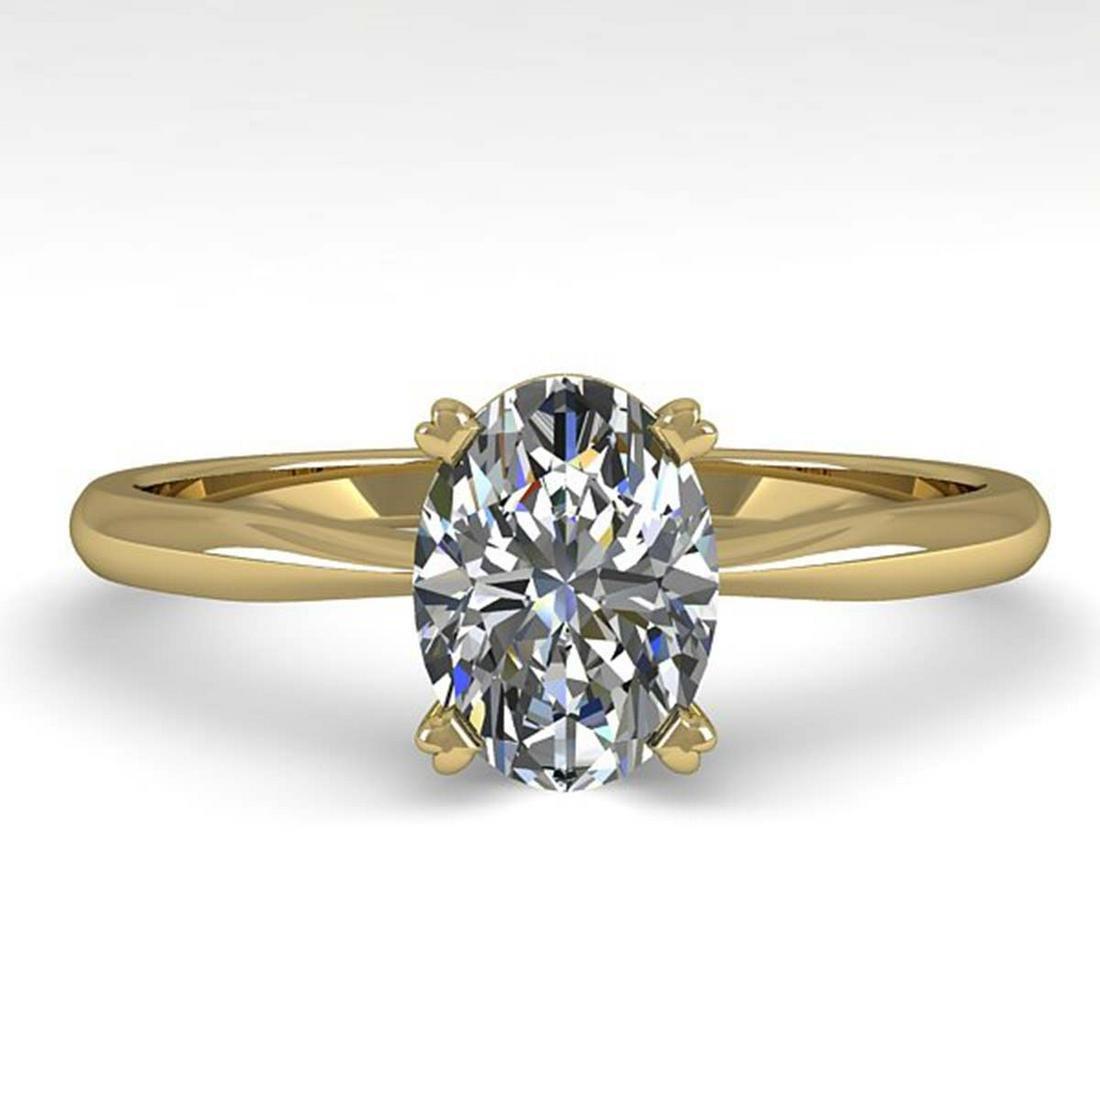 1 ctw VS/SI Oval Cut Diamond Ring 14K Yellow Gold